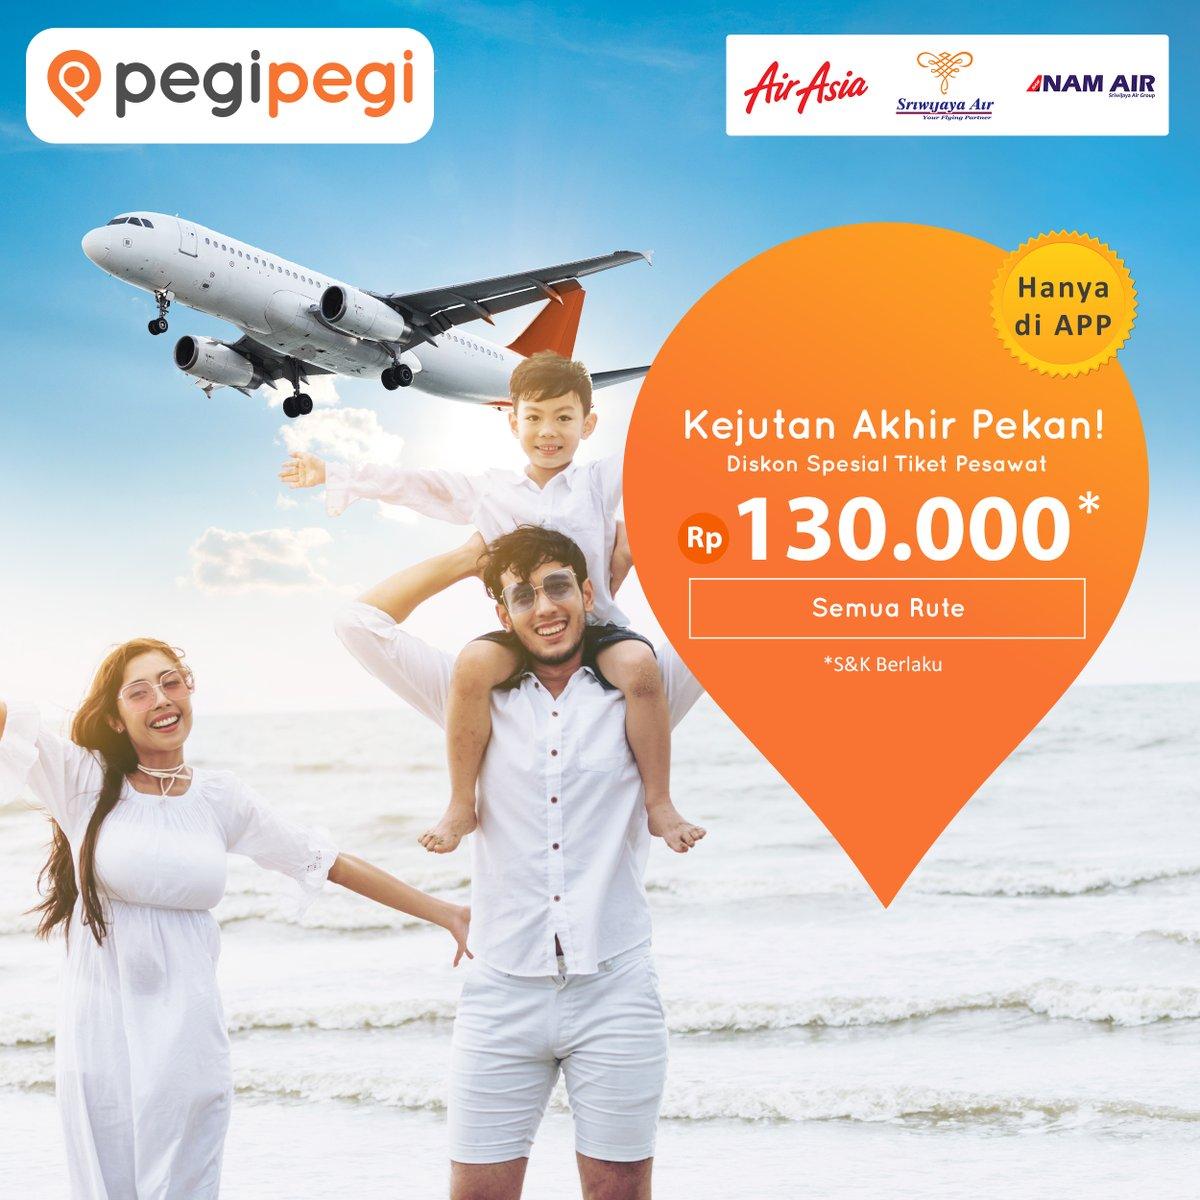 PegiPegi - Promo Tiket Semua Rute 130 Ribu Untuk AirAsia, Sriwijaya Air, dan NAM Air